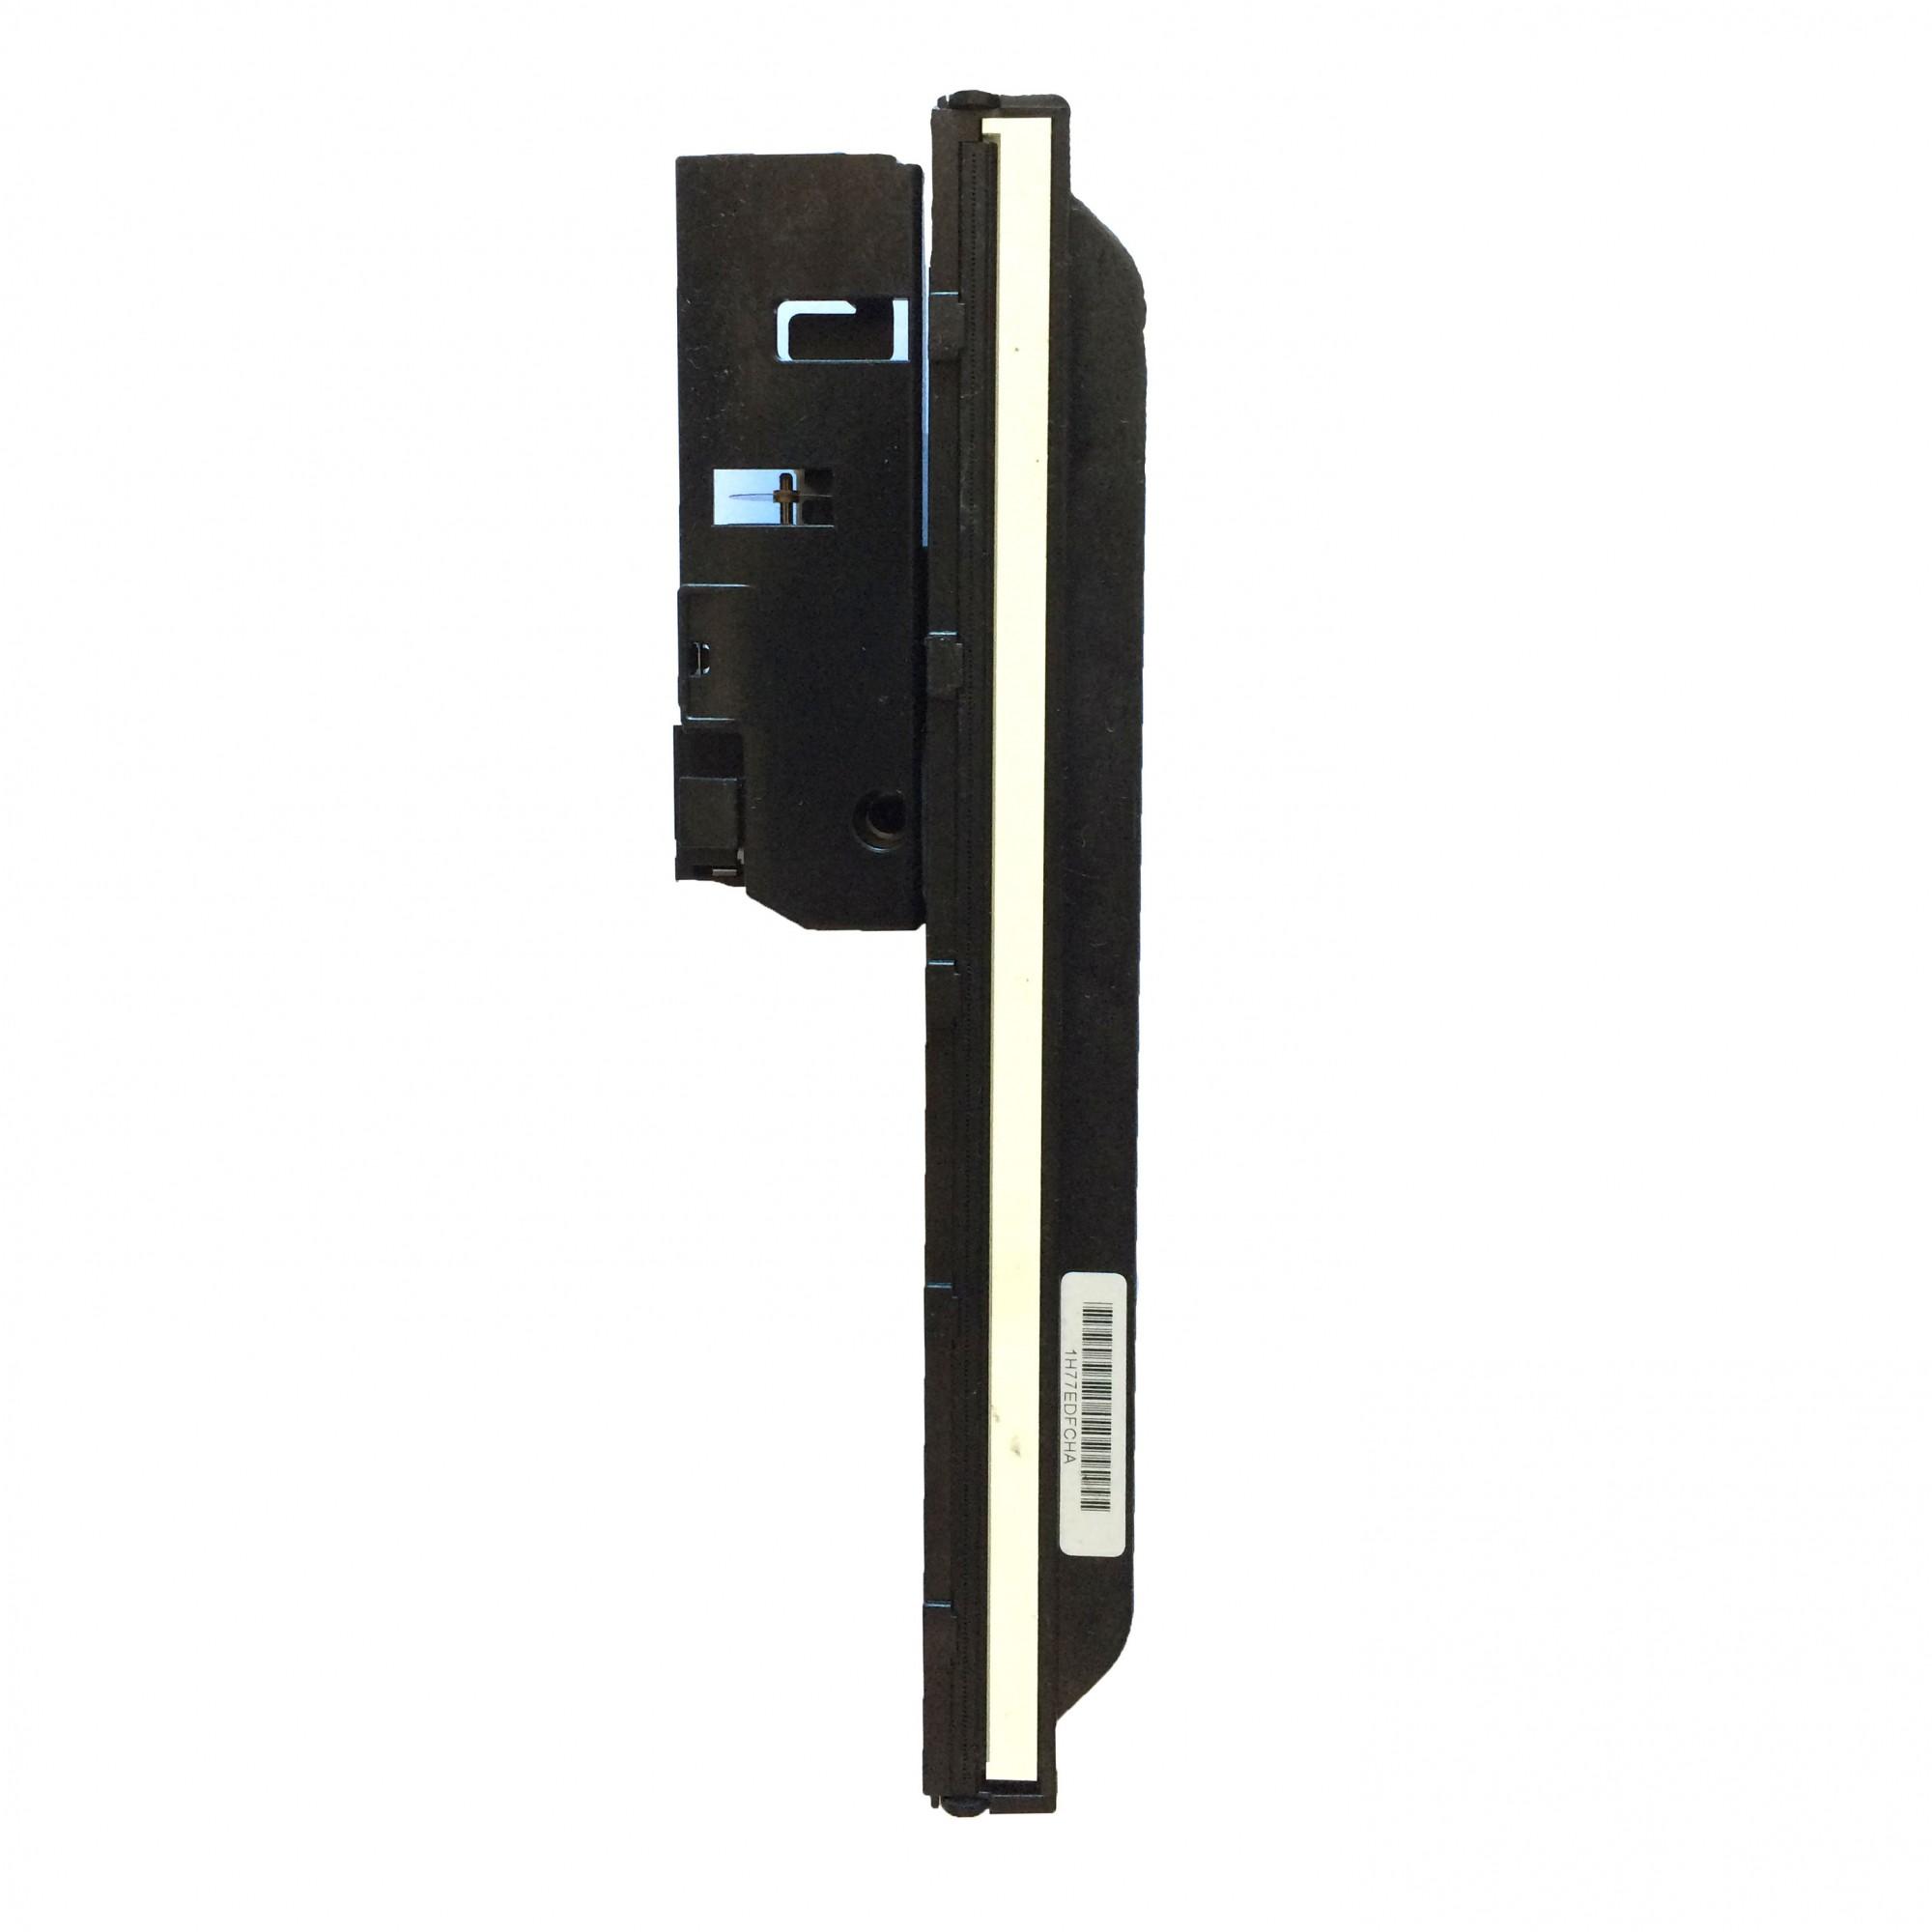 Scanner Multifuncional HP Deskjet Ink Advantage 3516 - Retirado